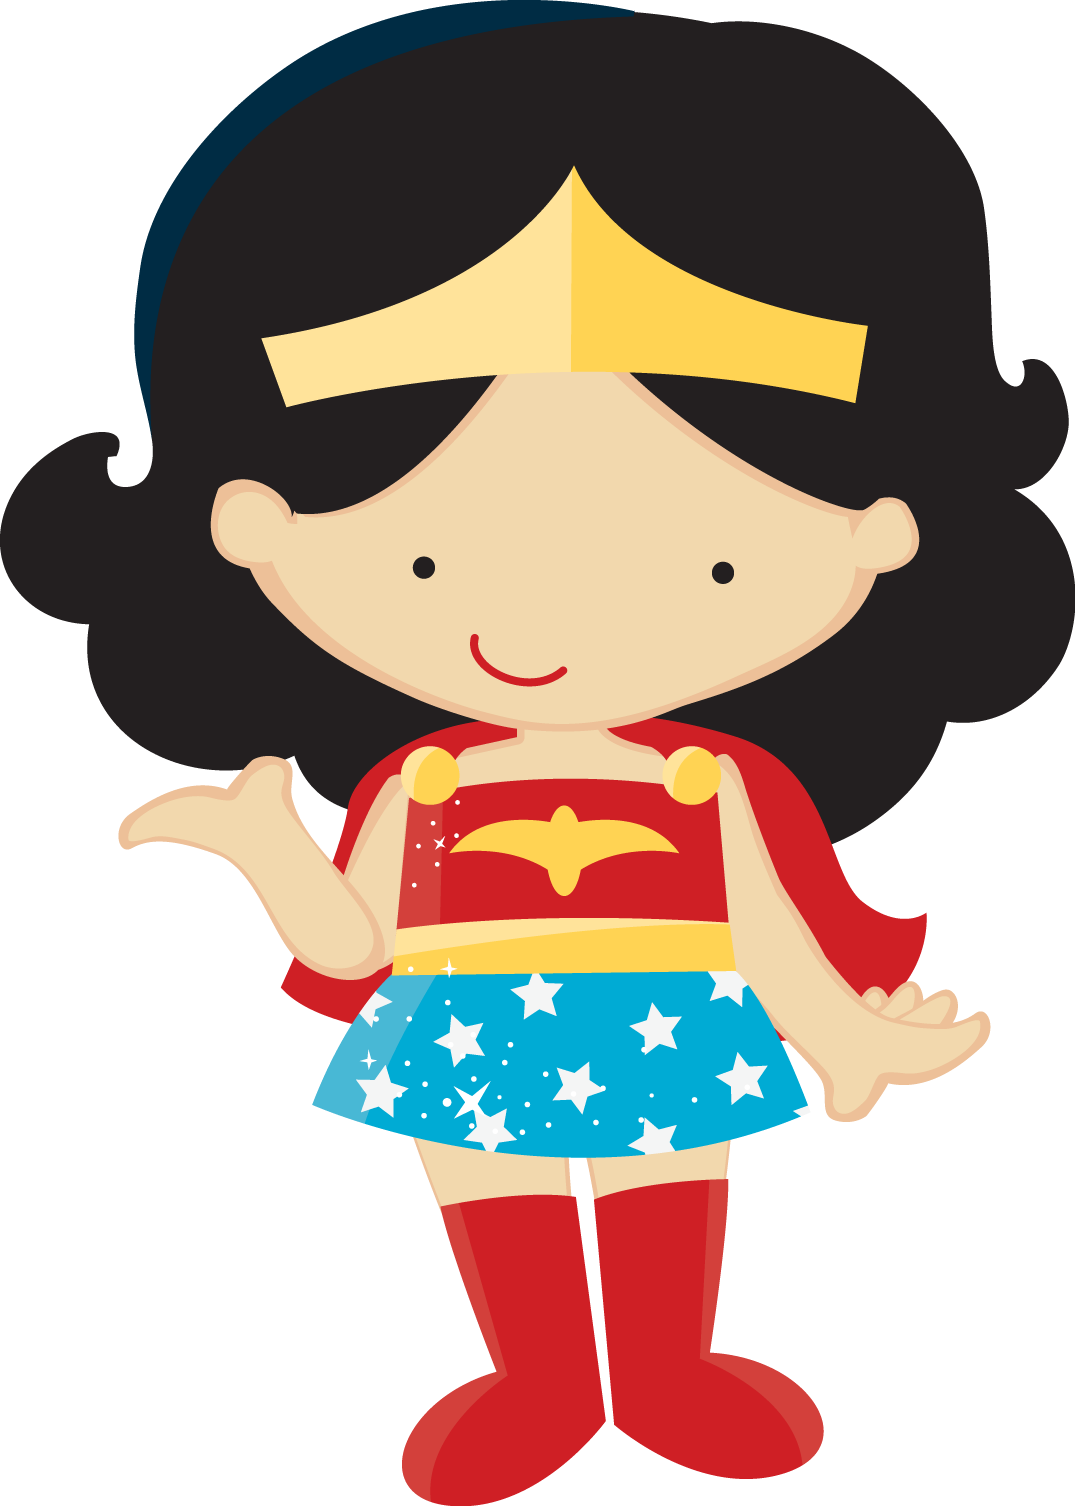 Clipart of Wonder Woman Baby in Differen-Clipart of Wonder Woman Baby in Different Styles.-19